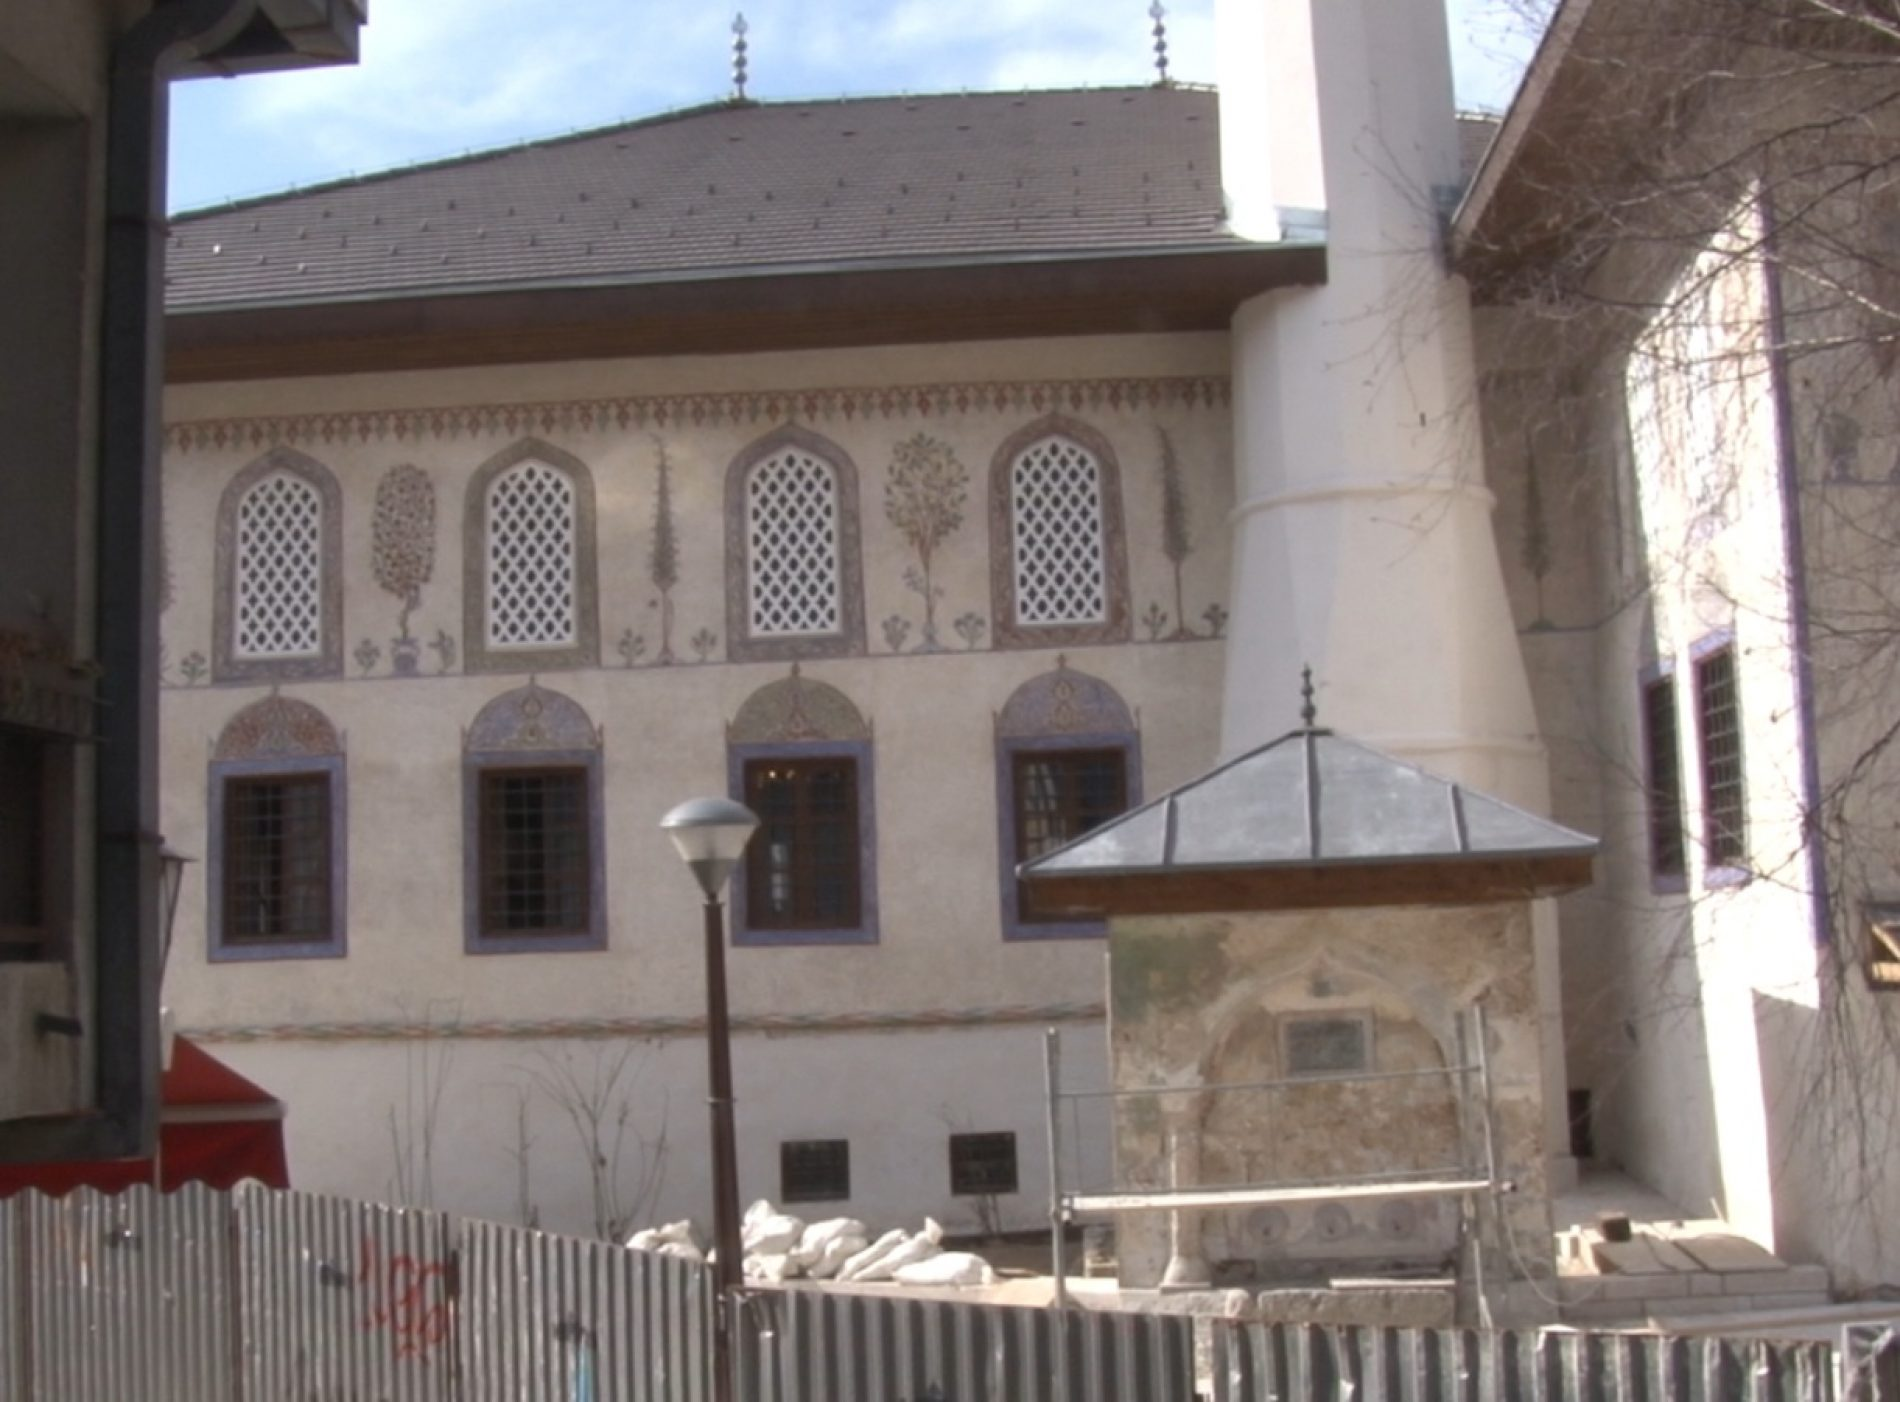 Travnik: Šarena džamija vraća stari sjaj (Video)